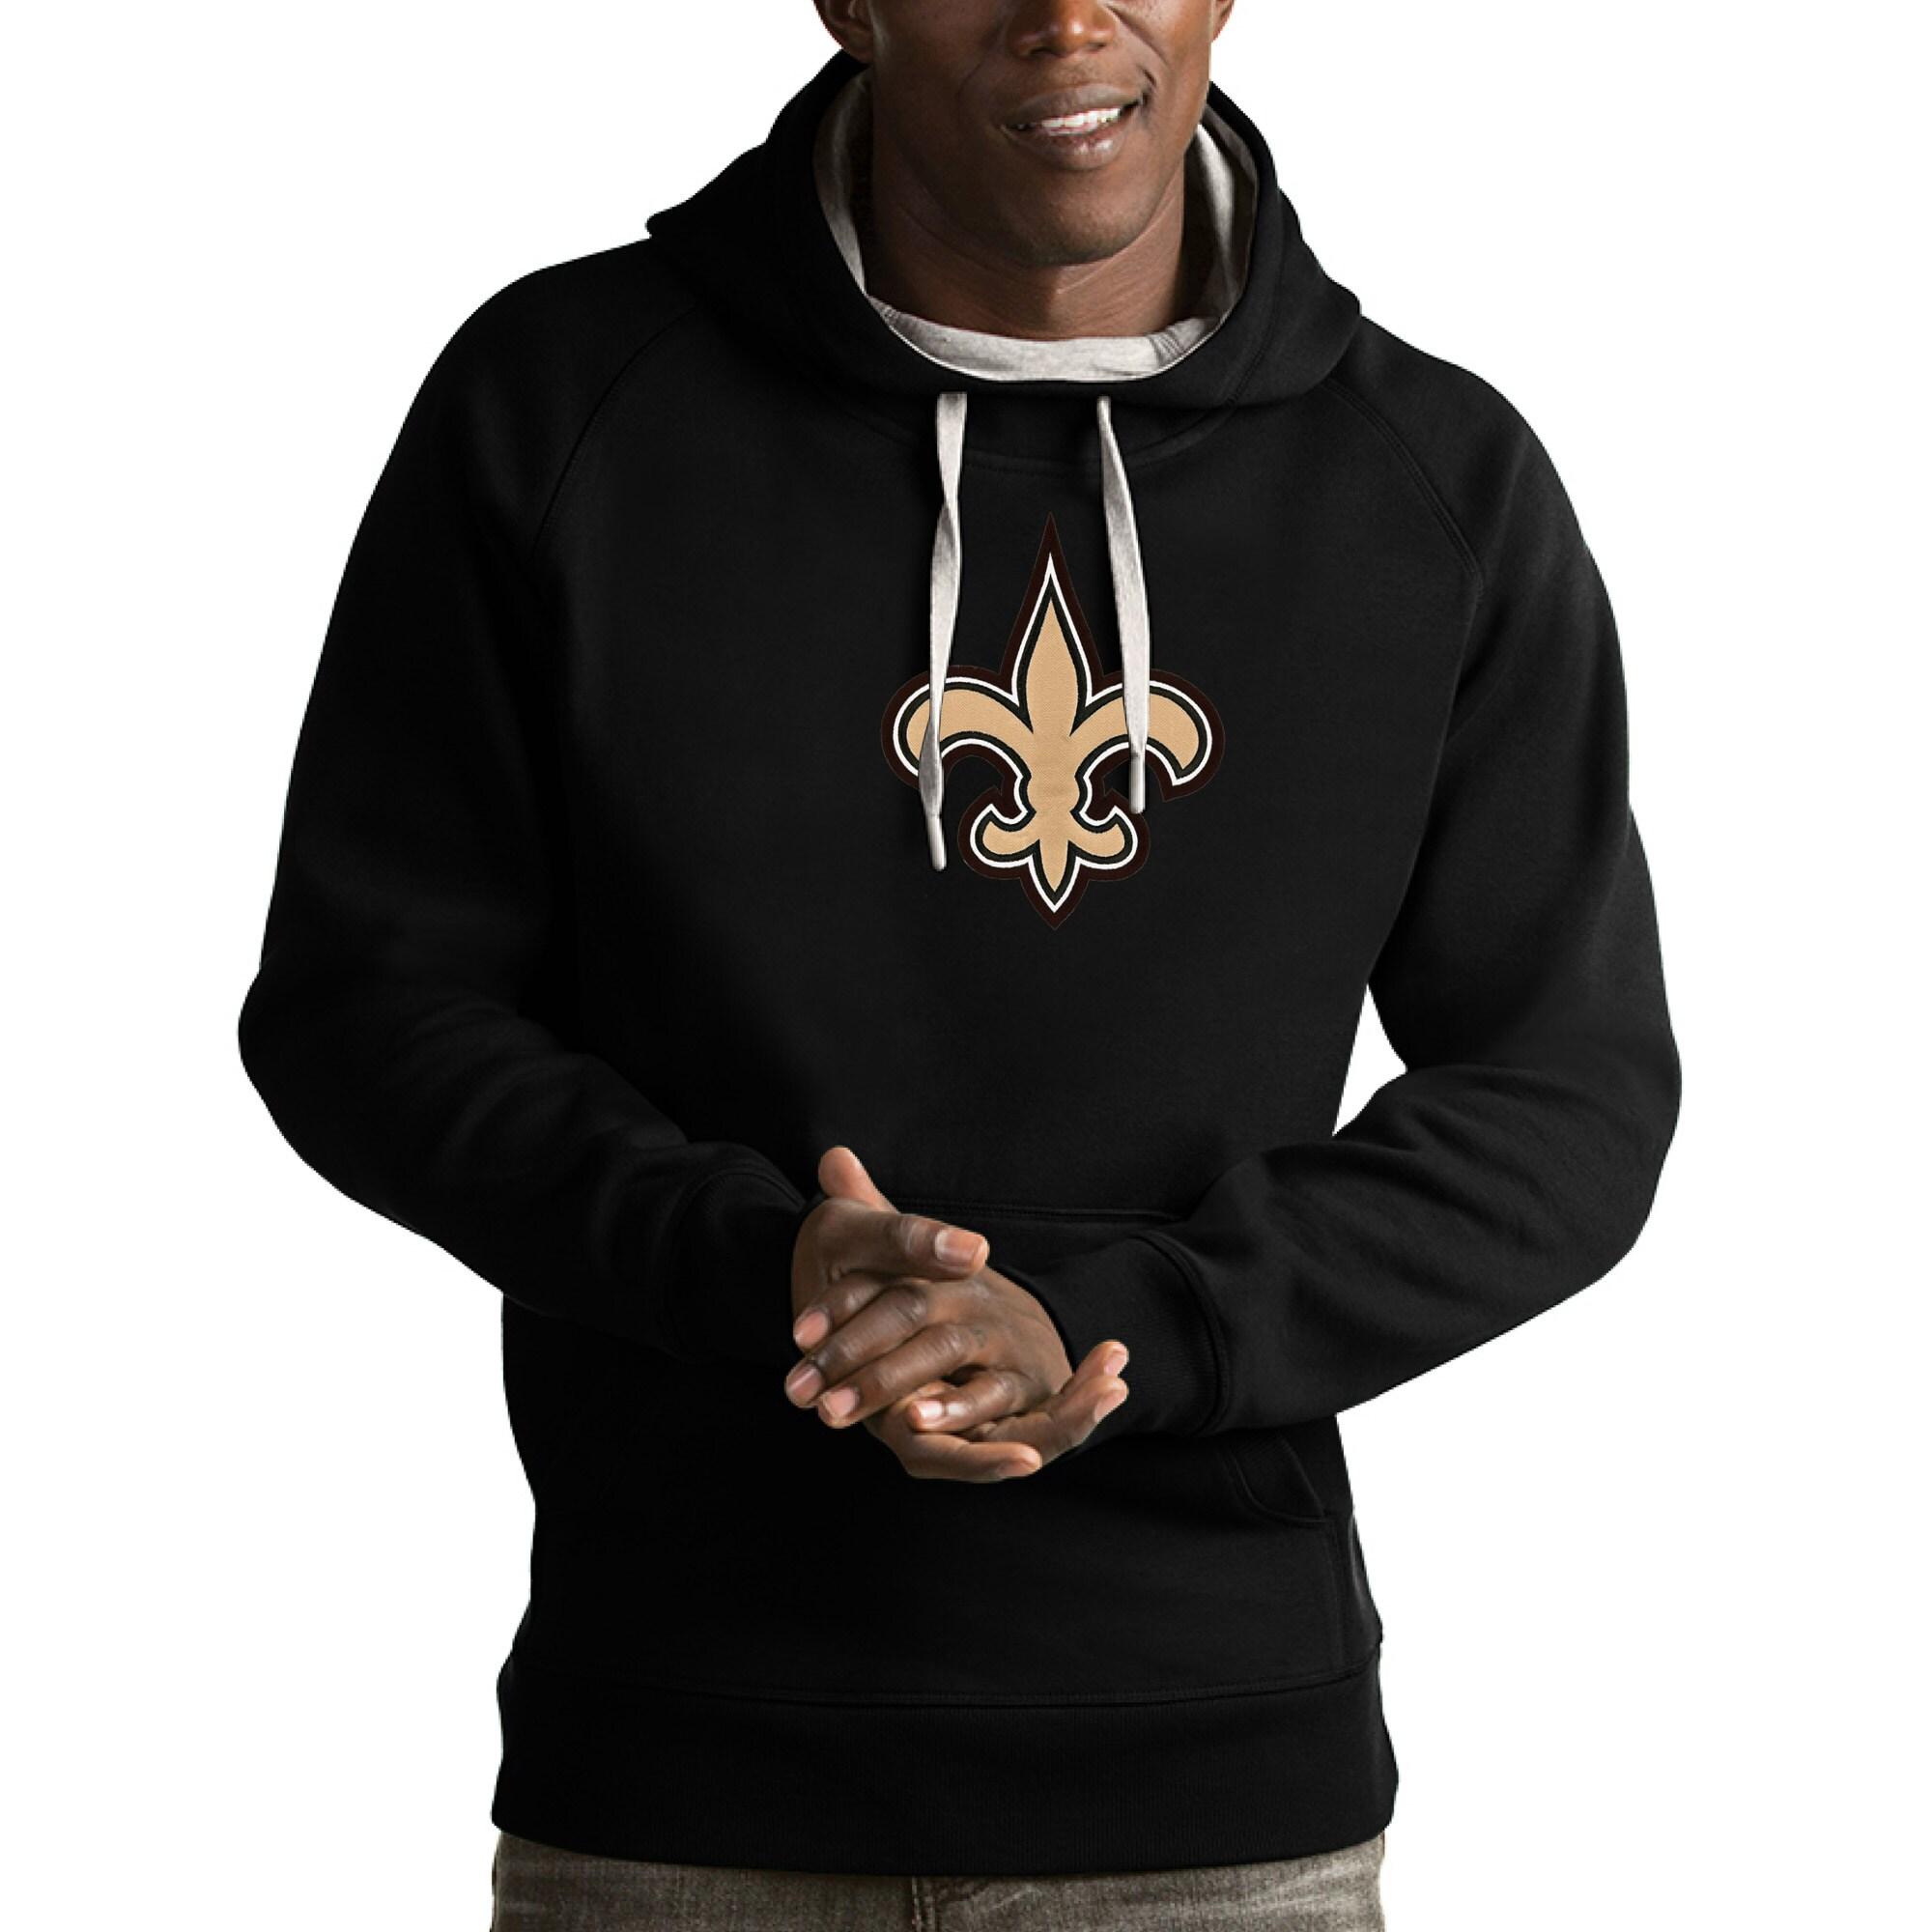 New Orleans Saints Antigua Victory Pullover Hoodie - Black